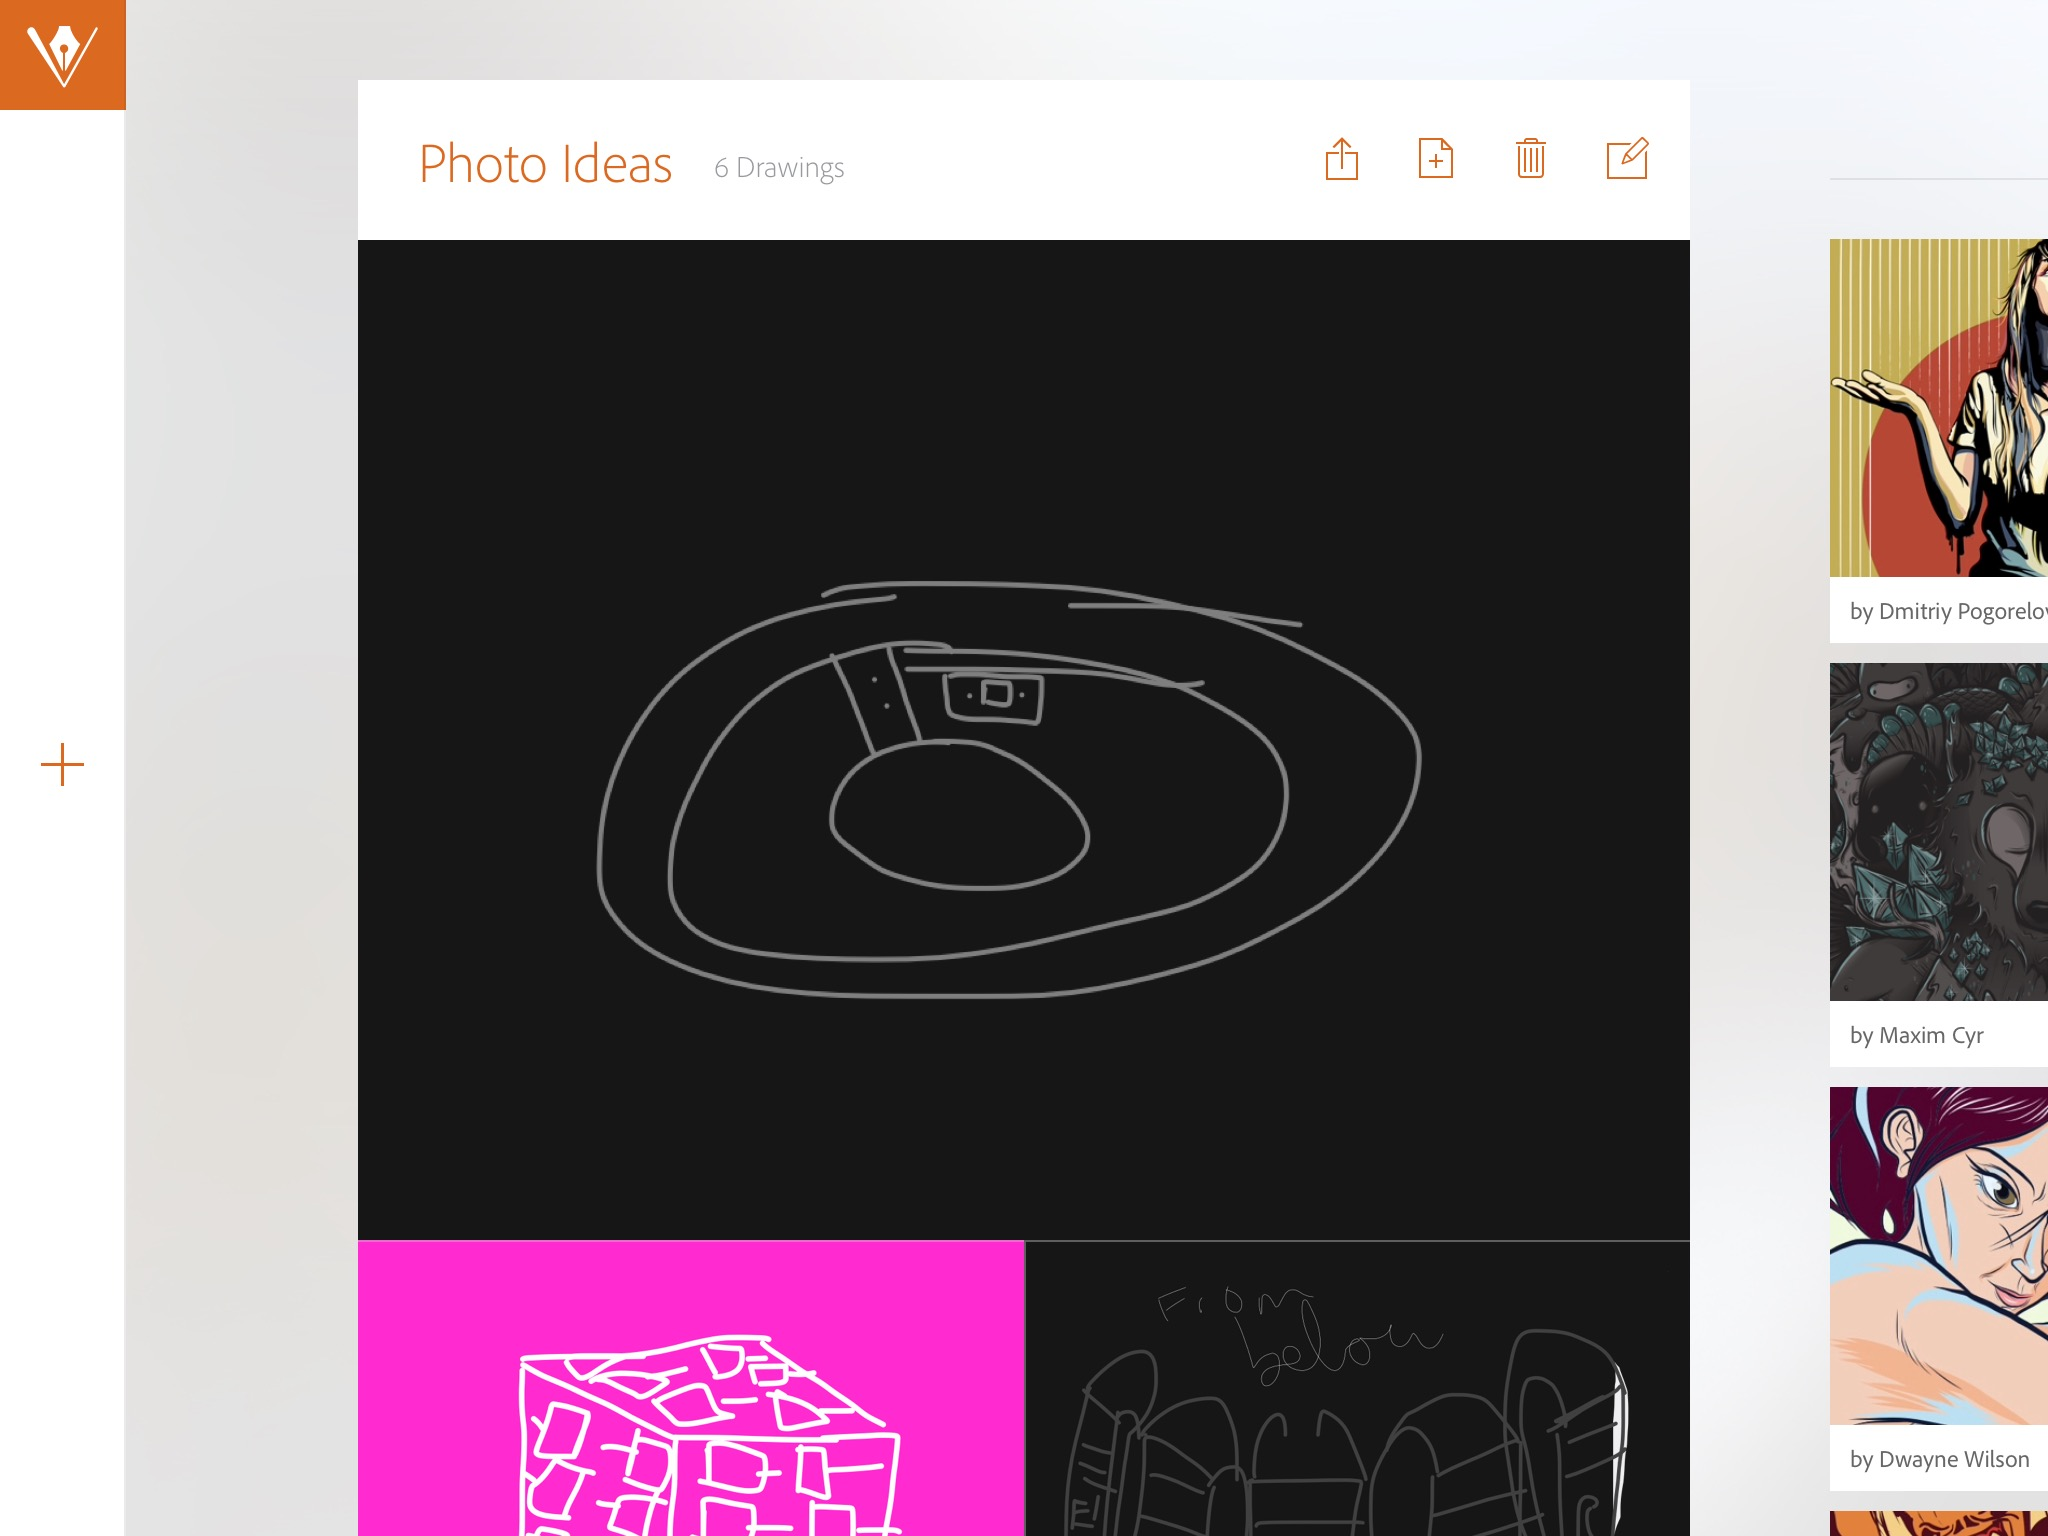 The app's homescreen